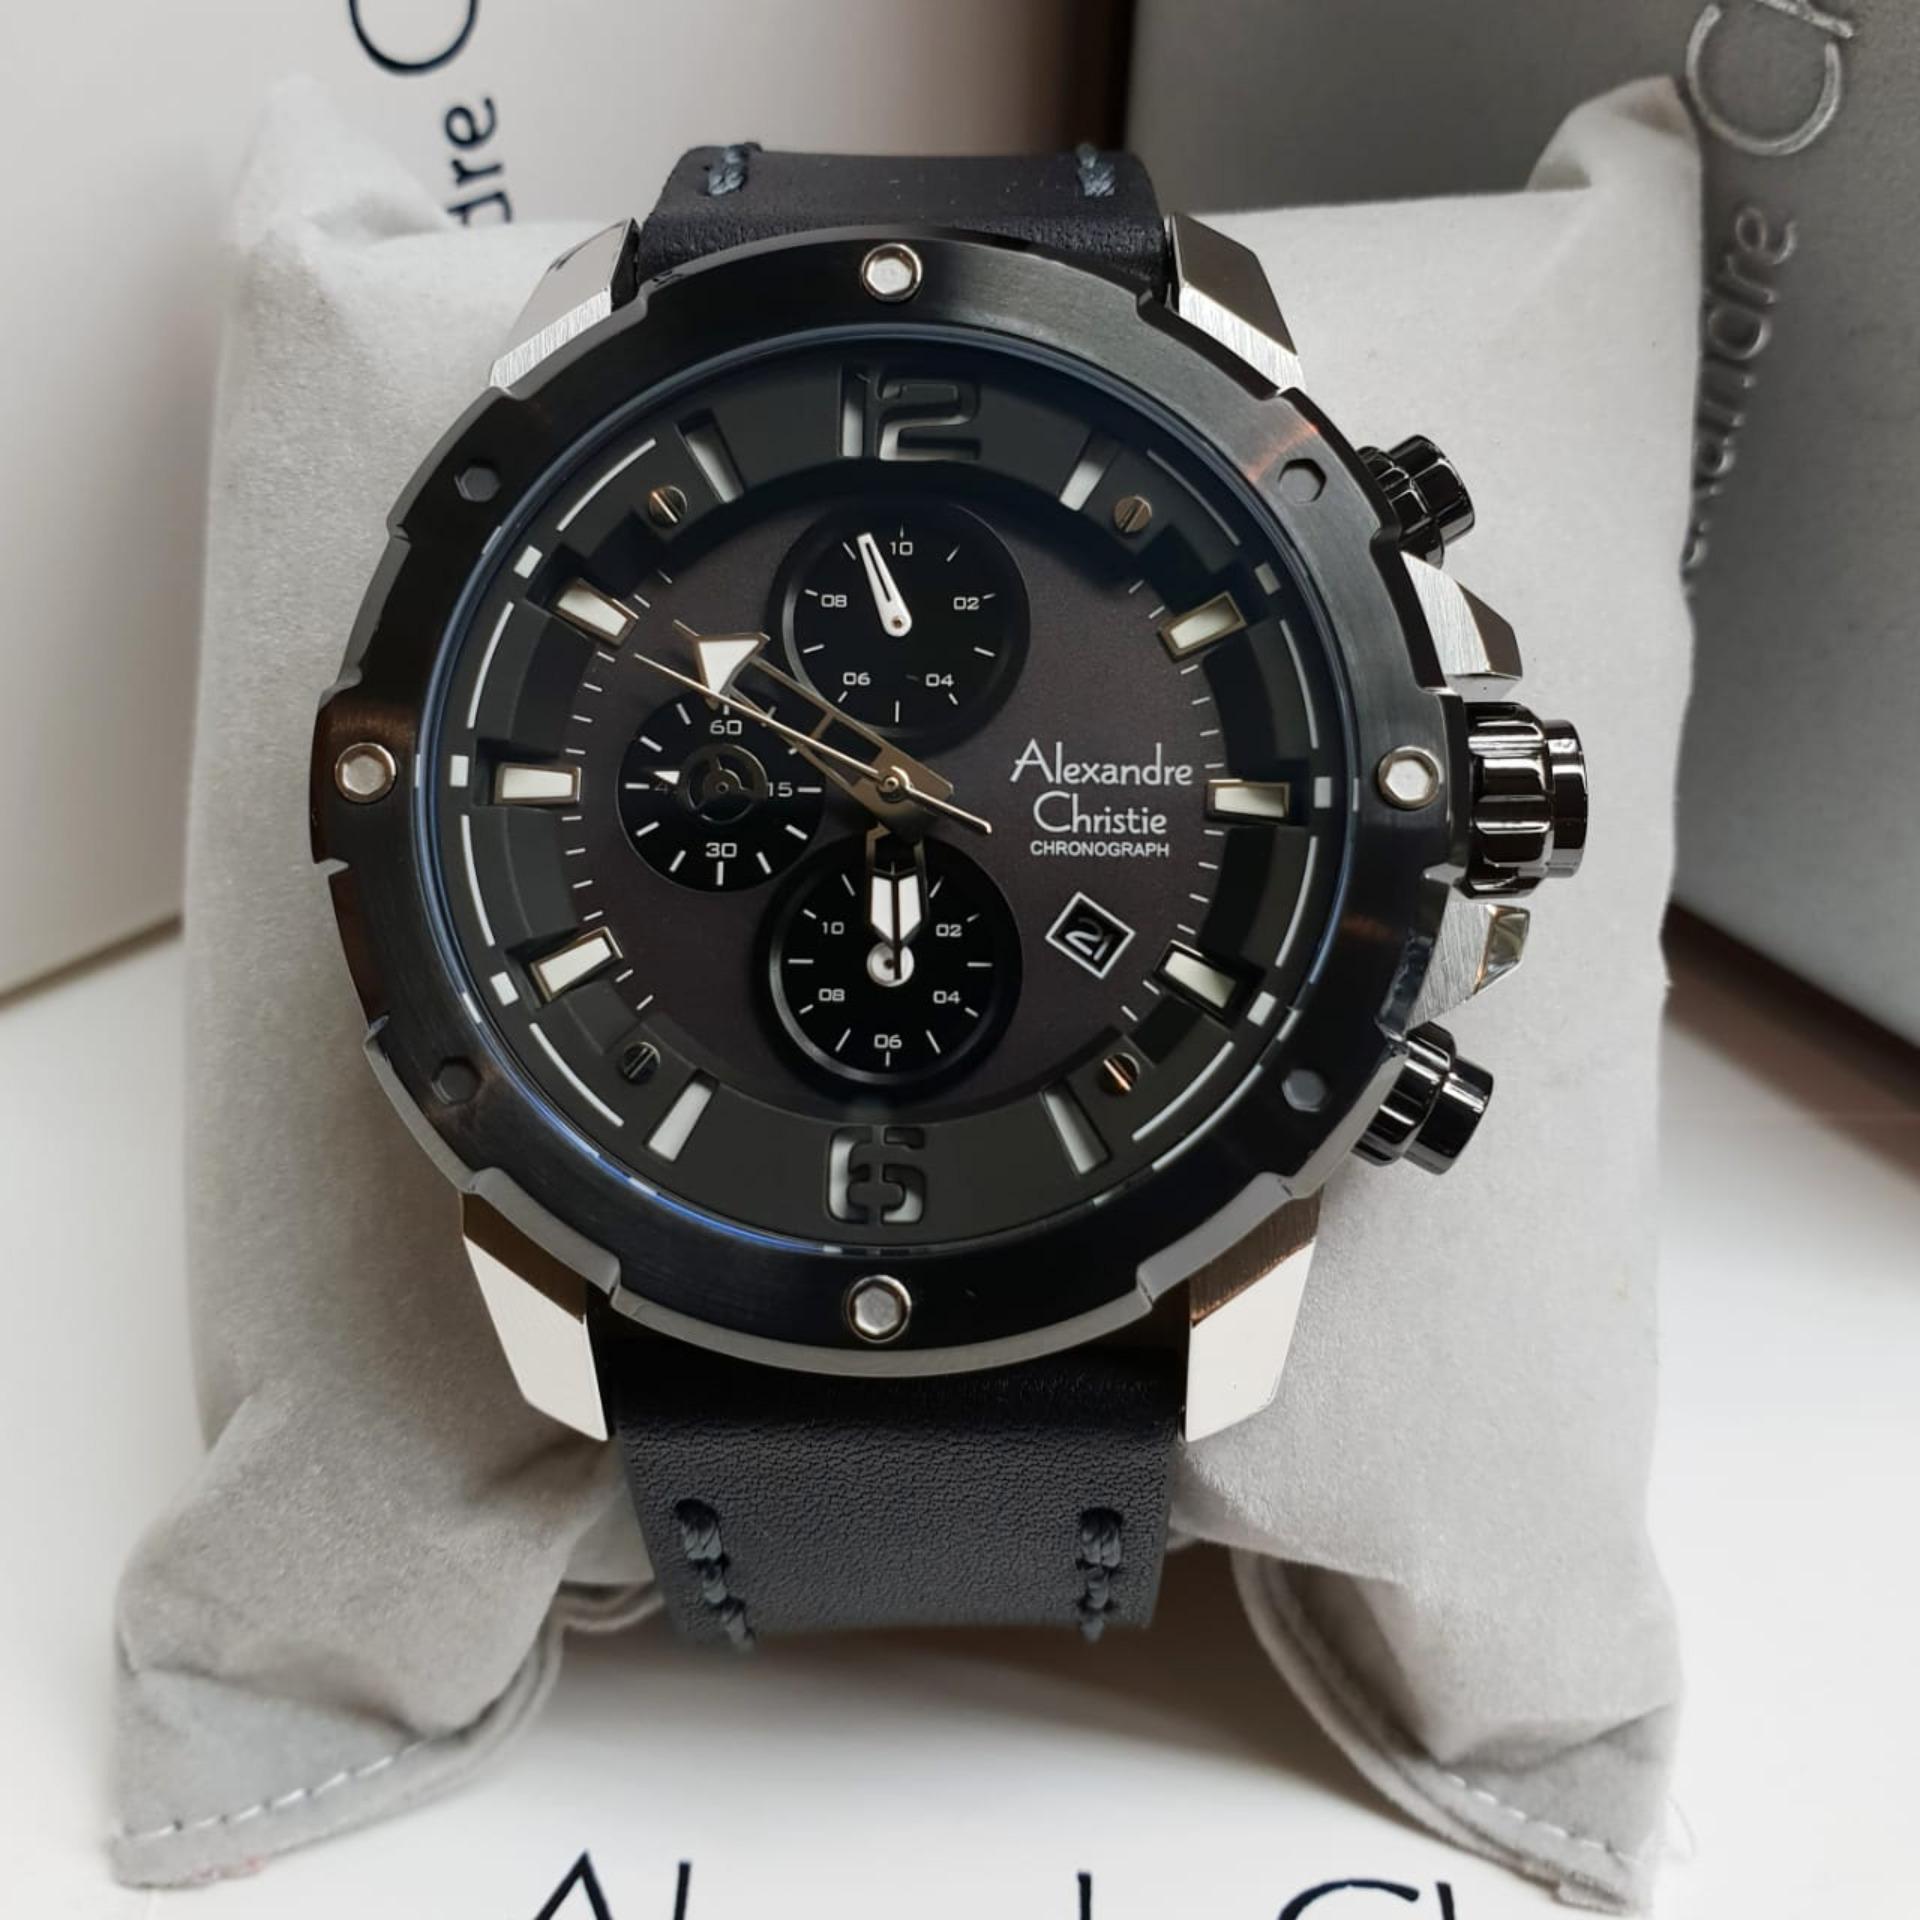 Alexandre Christie AC6410 Original Jam Tangan Pria Tali Kulit Hitam Silver f356d75c23